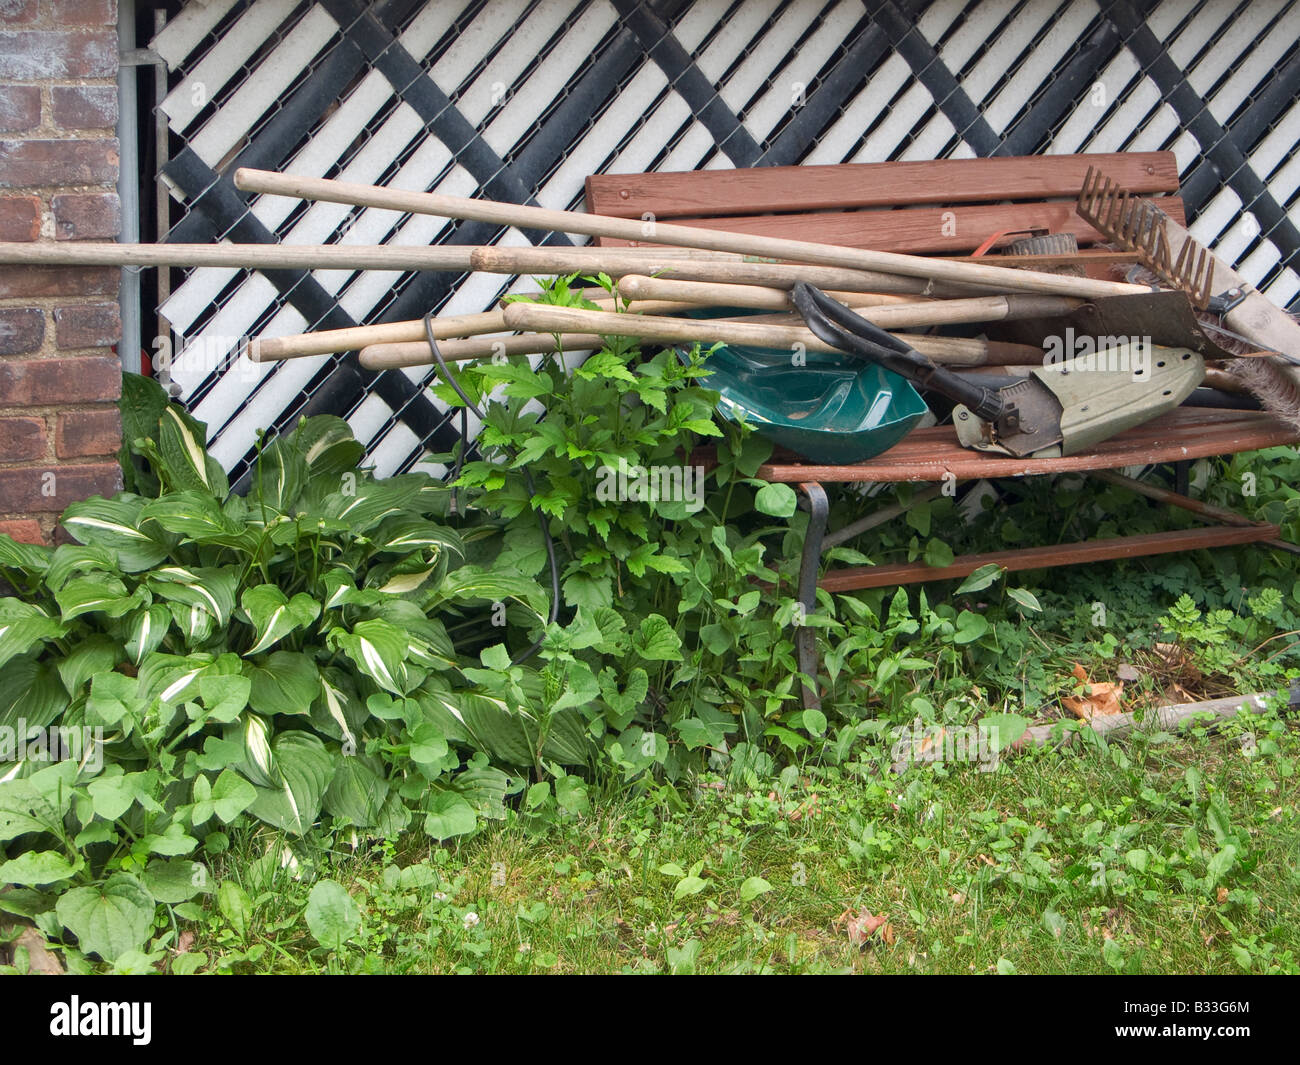 Yard tools on bench - Stock Image